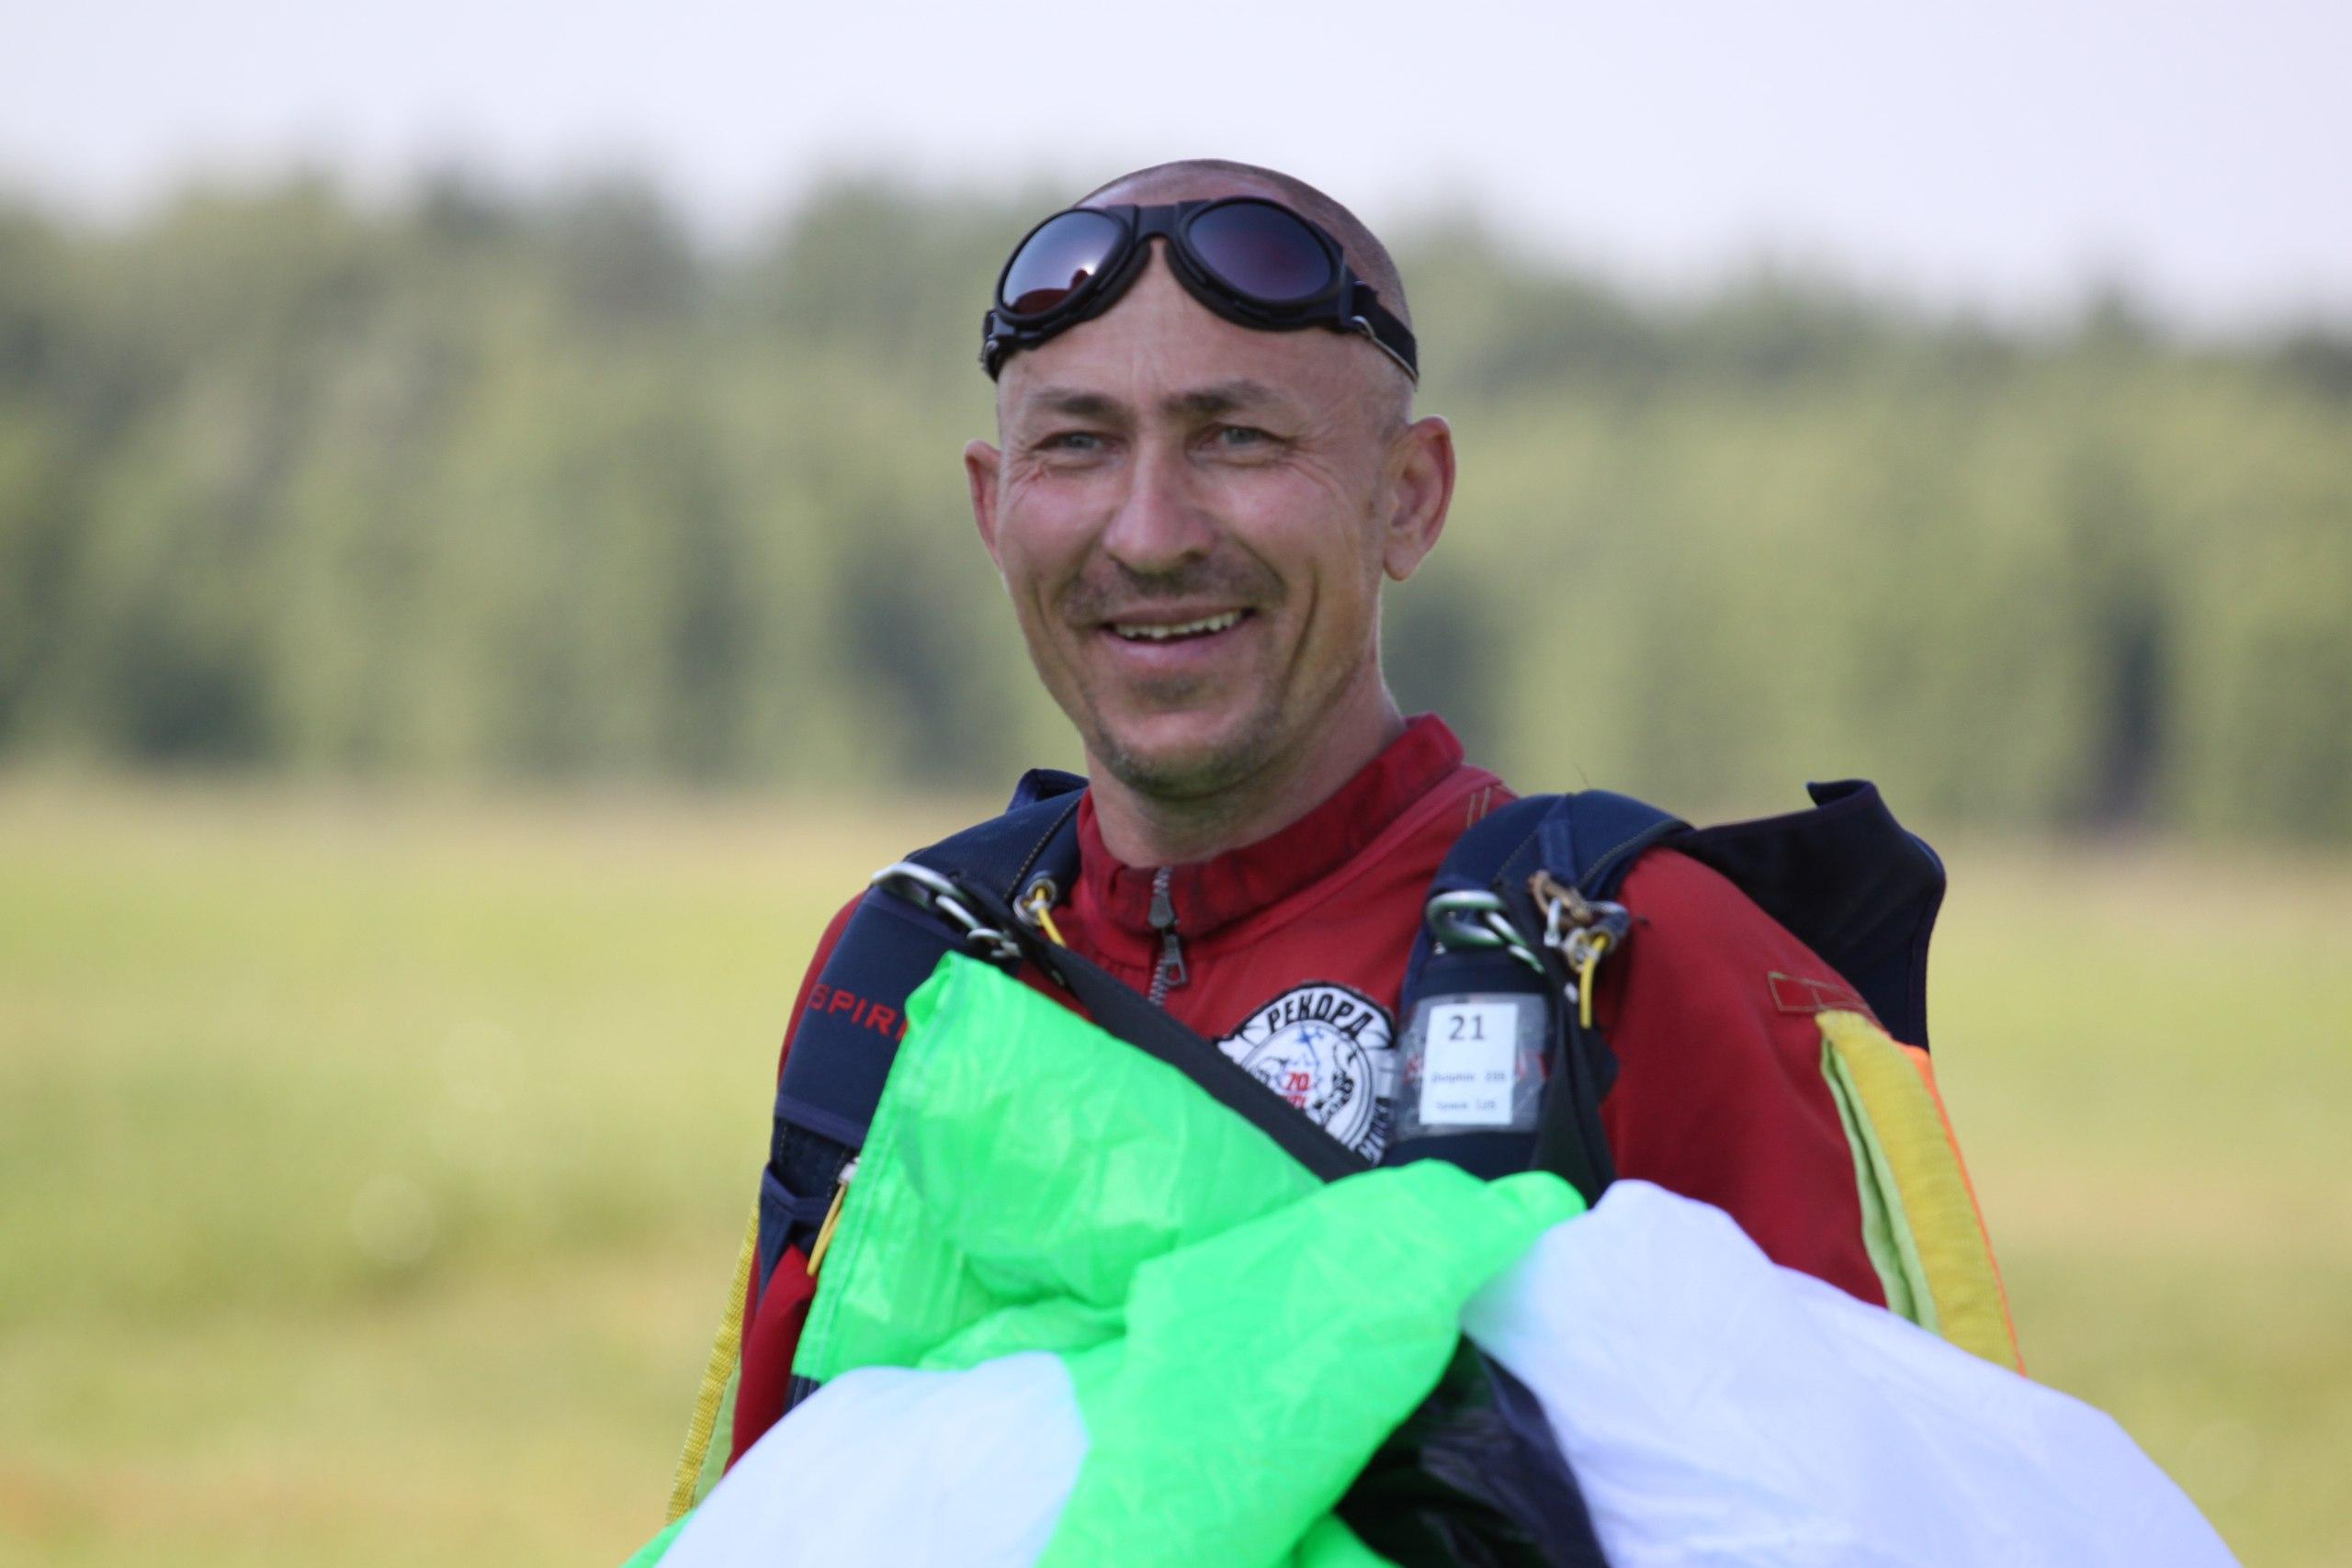 Валерий Кирикилица